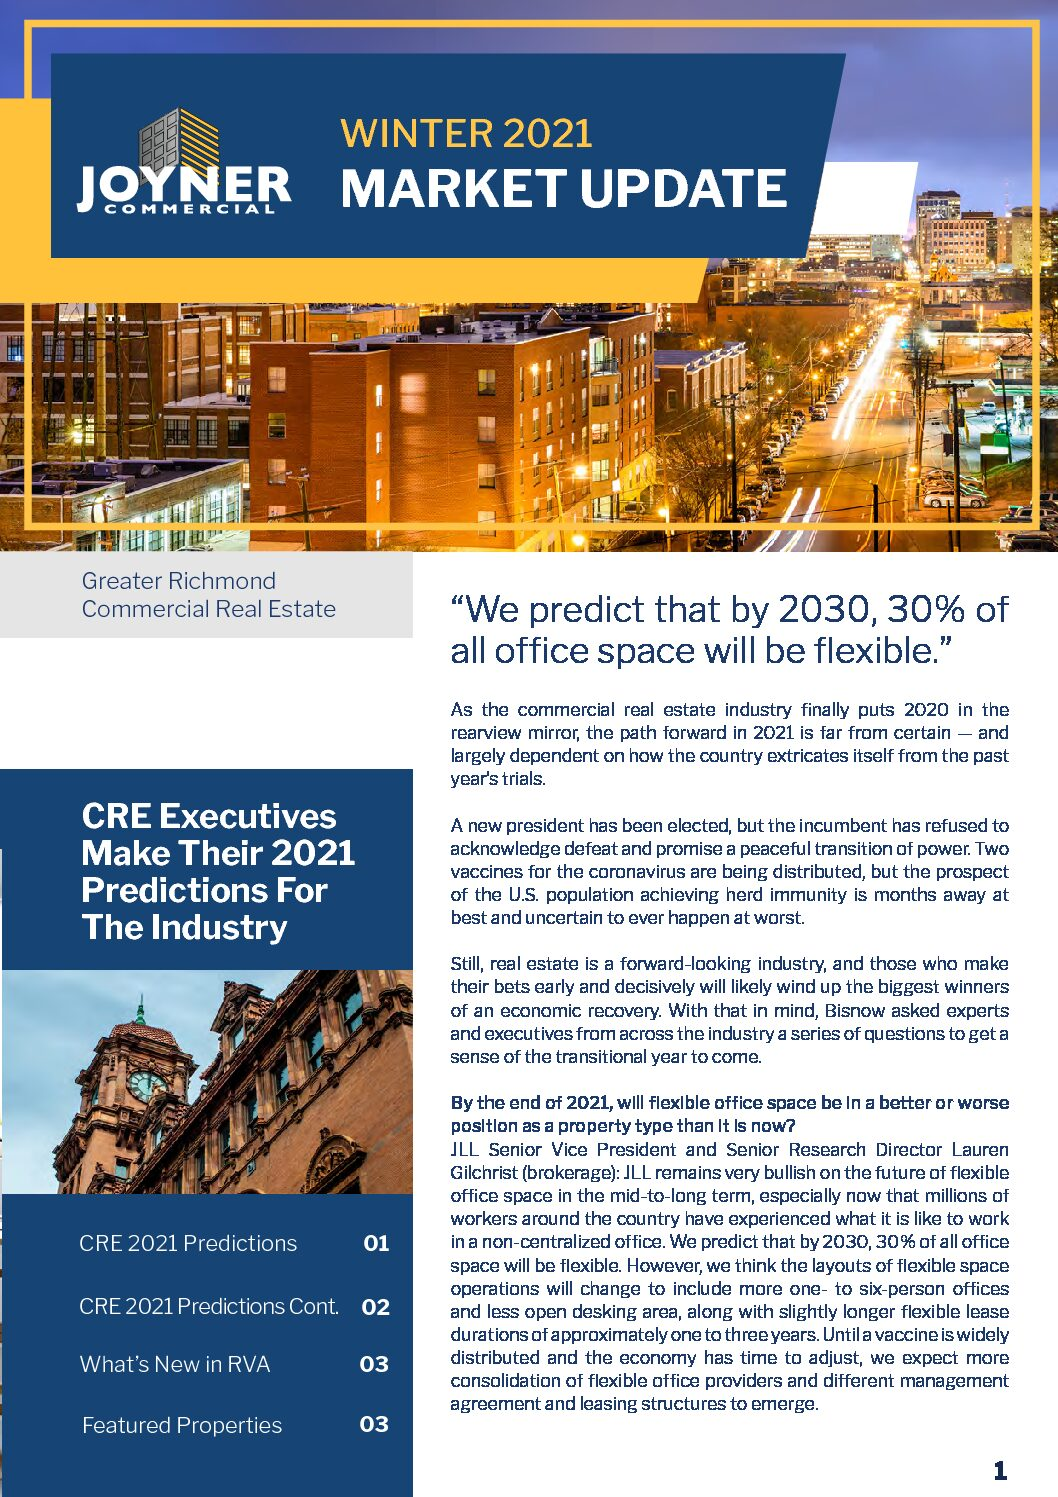 Joyner Commercial Market Update Winter 2021